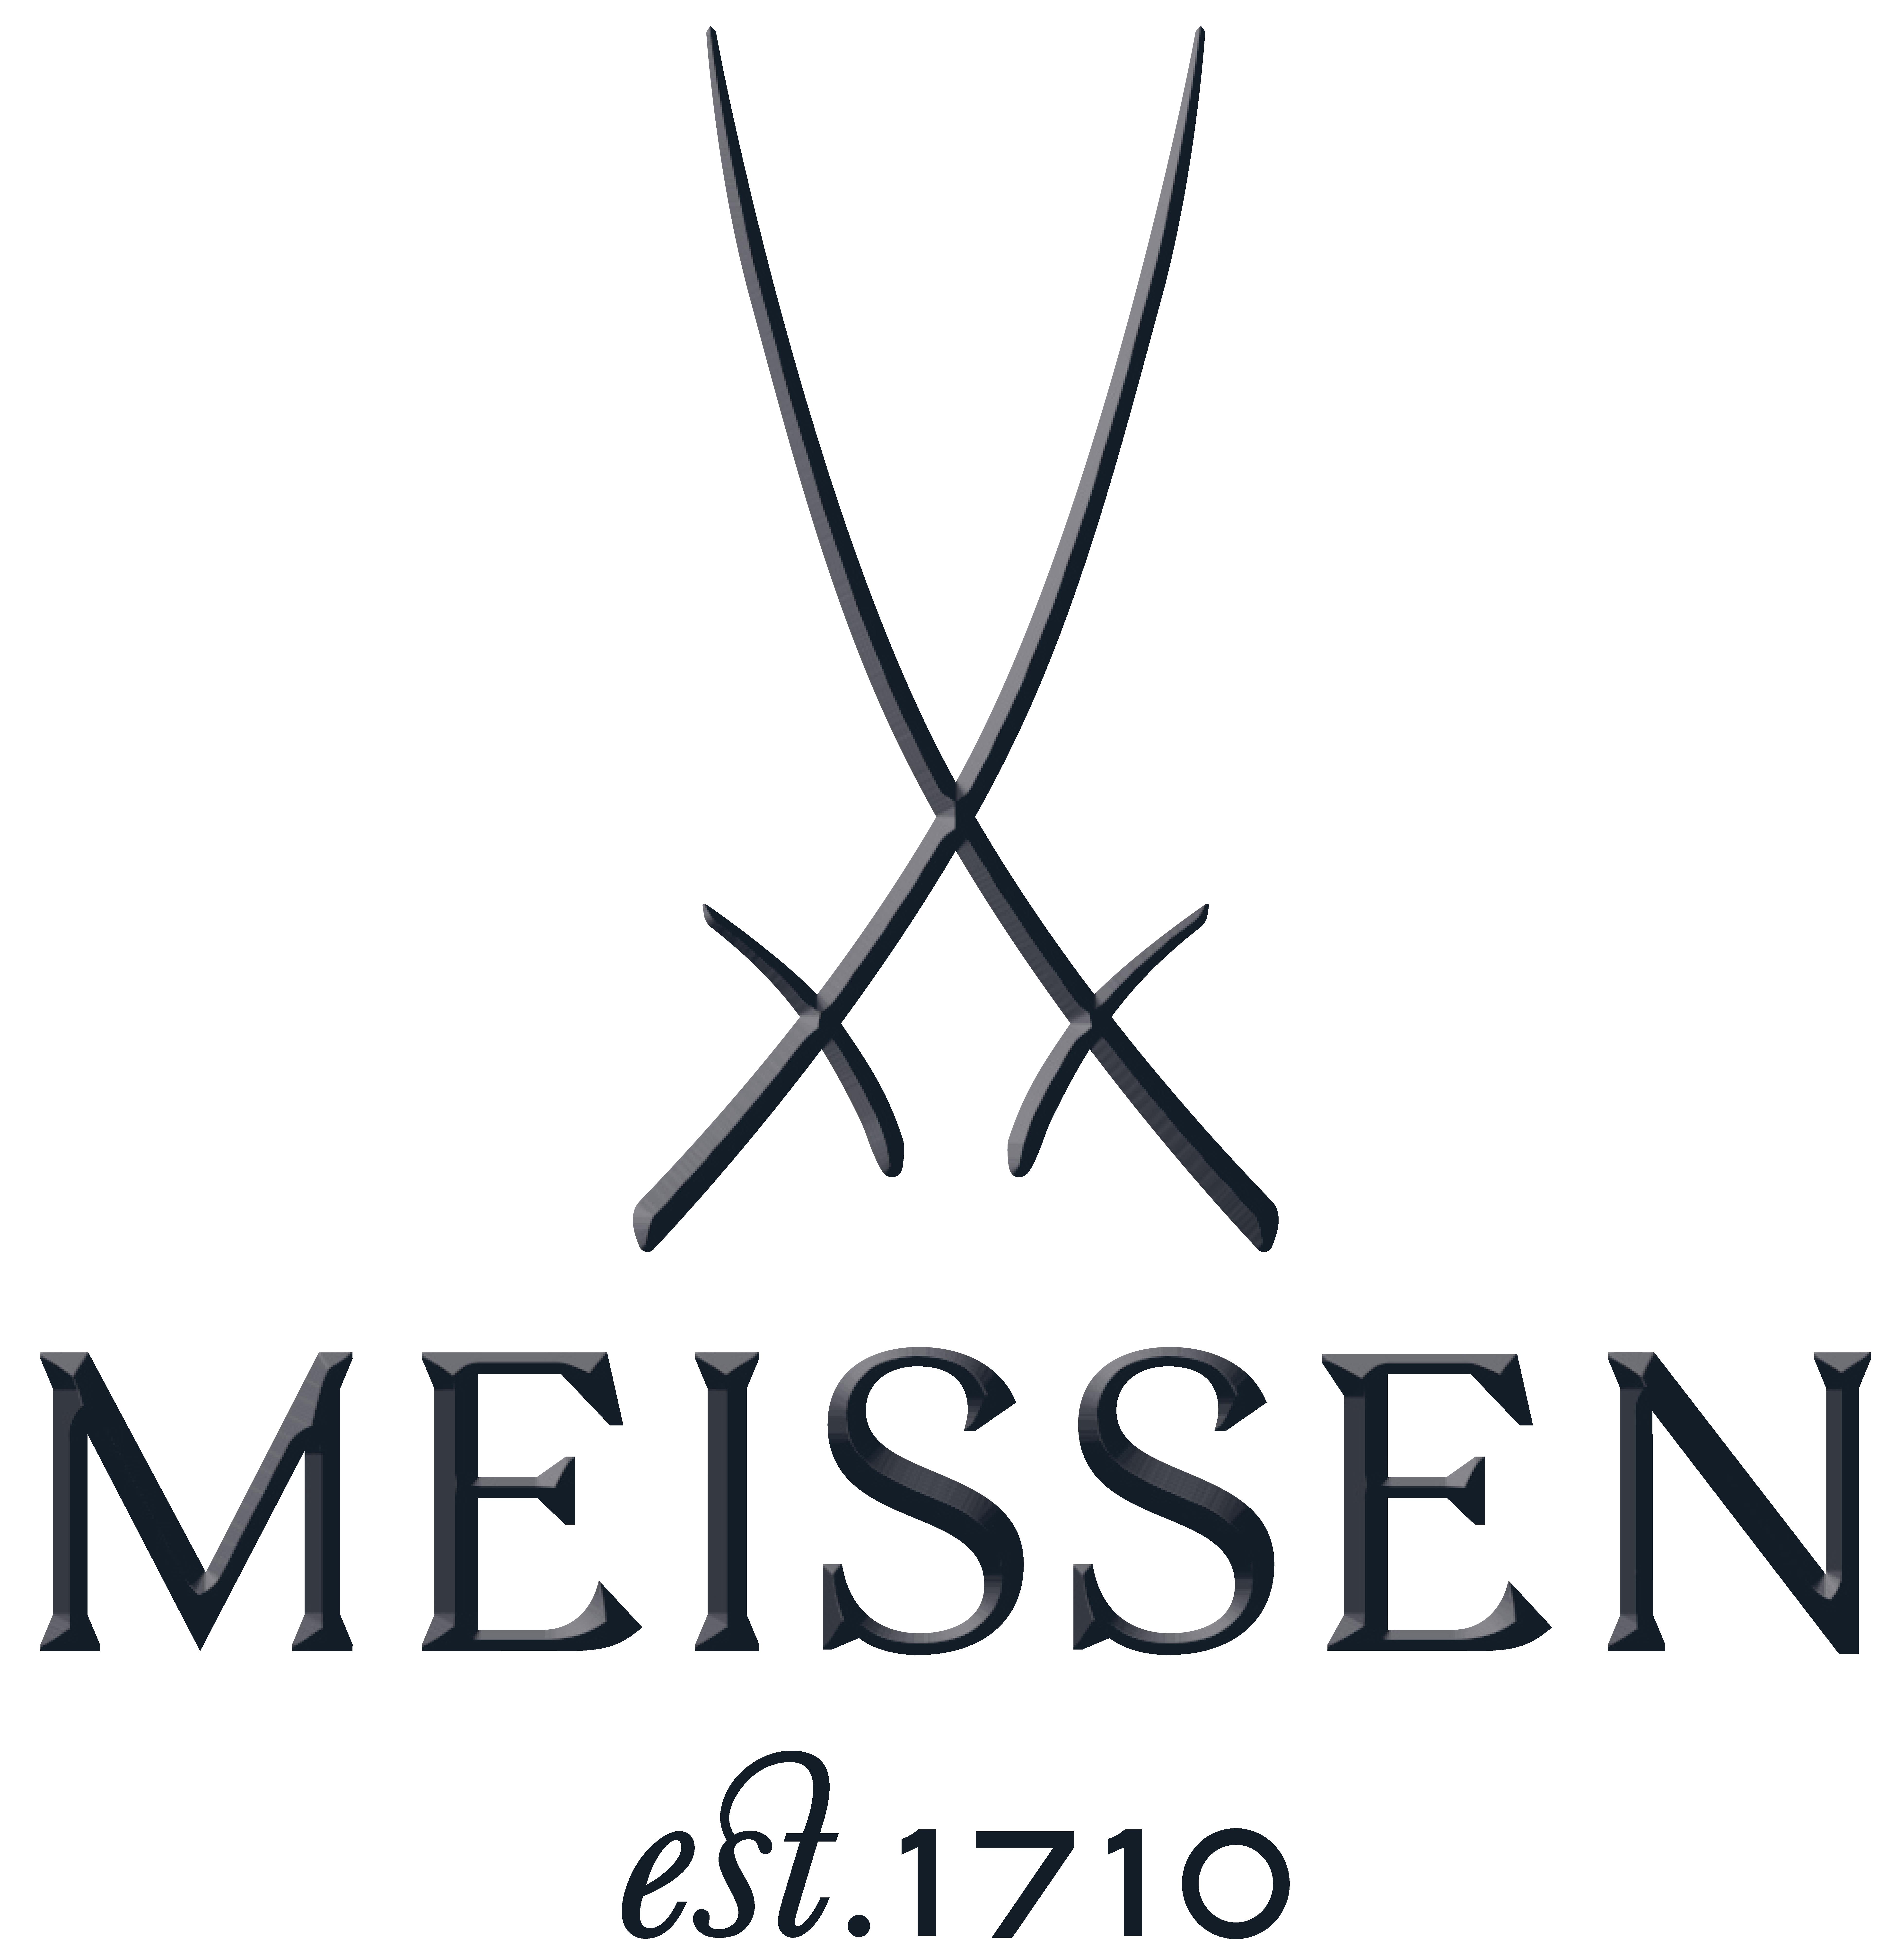 meissen-logo-3dembossed-blue